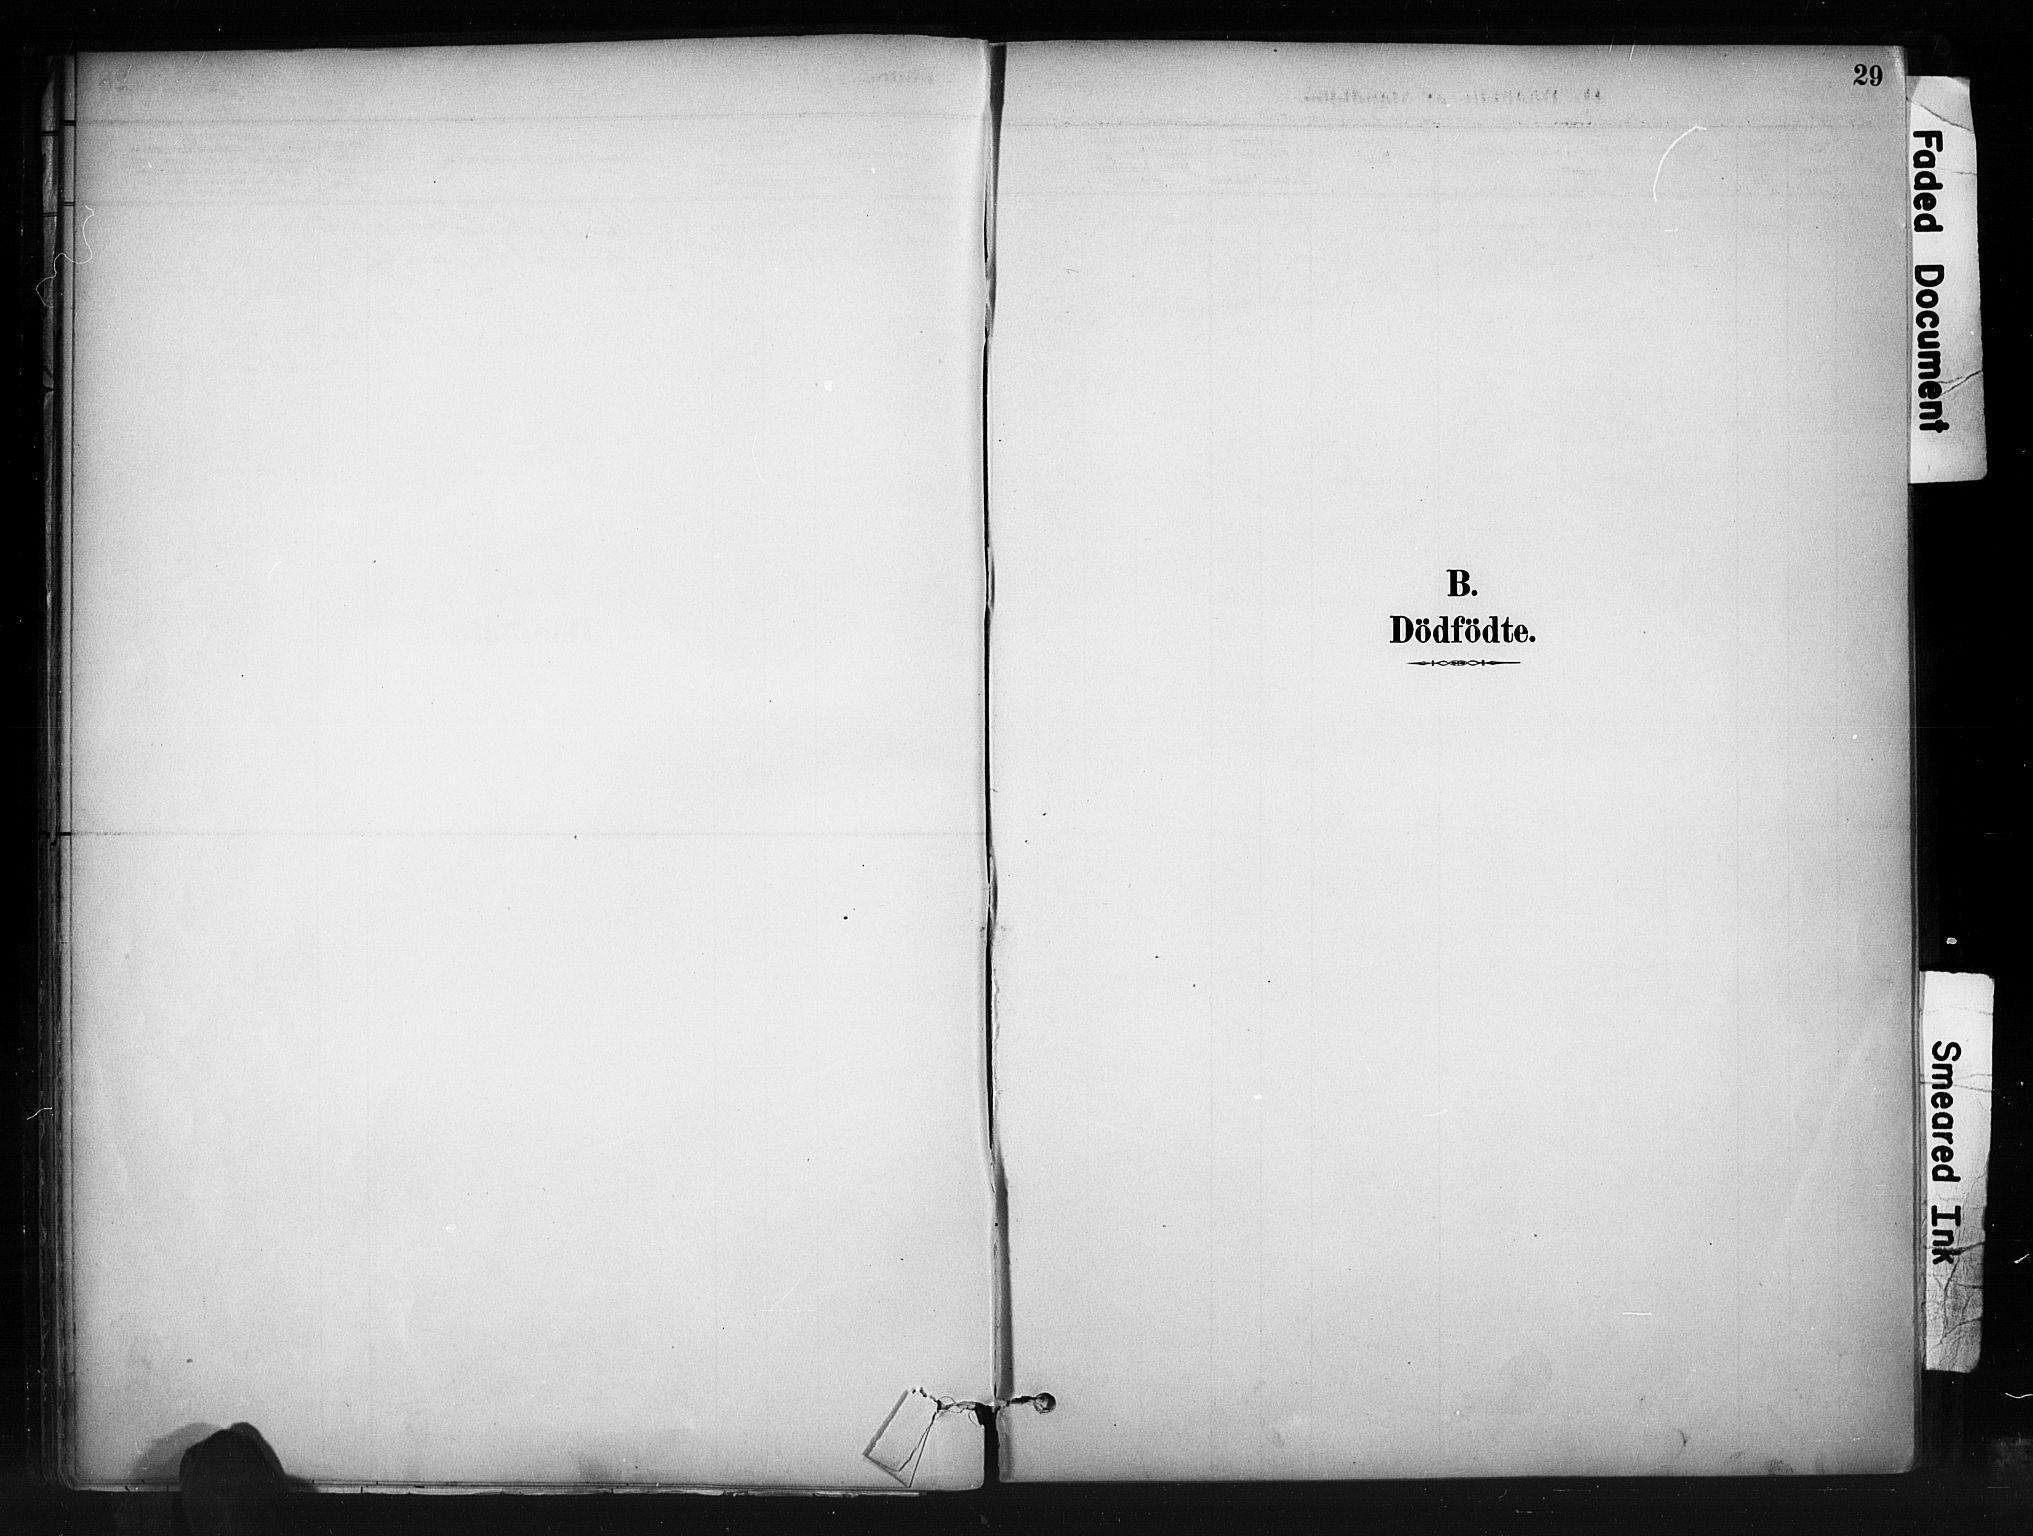 SAH, Nord-Aurdal prestekontor, Ministerialbok nr. 10, 1883-1896, s. 29